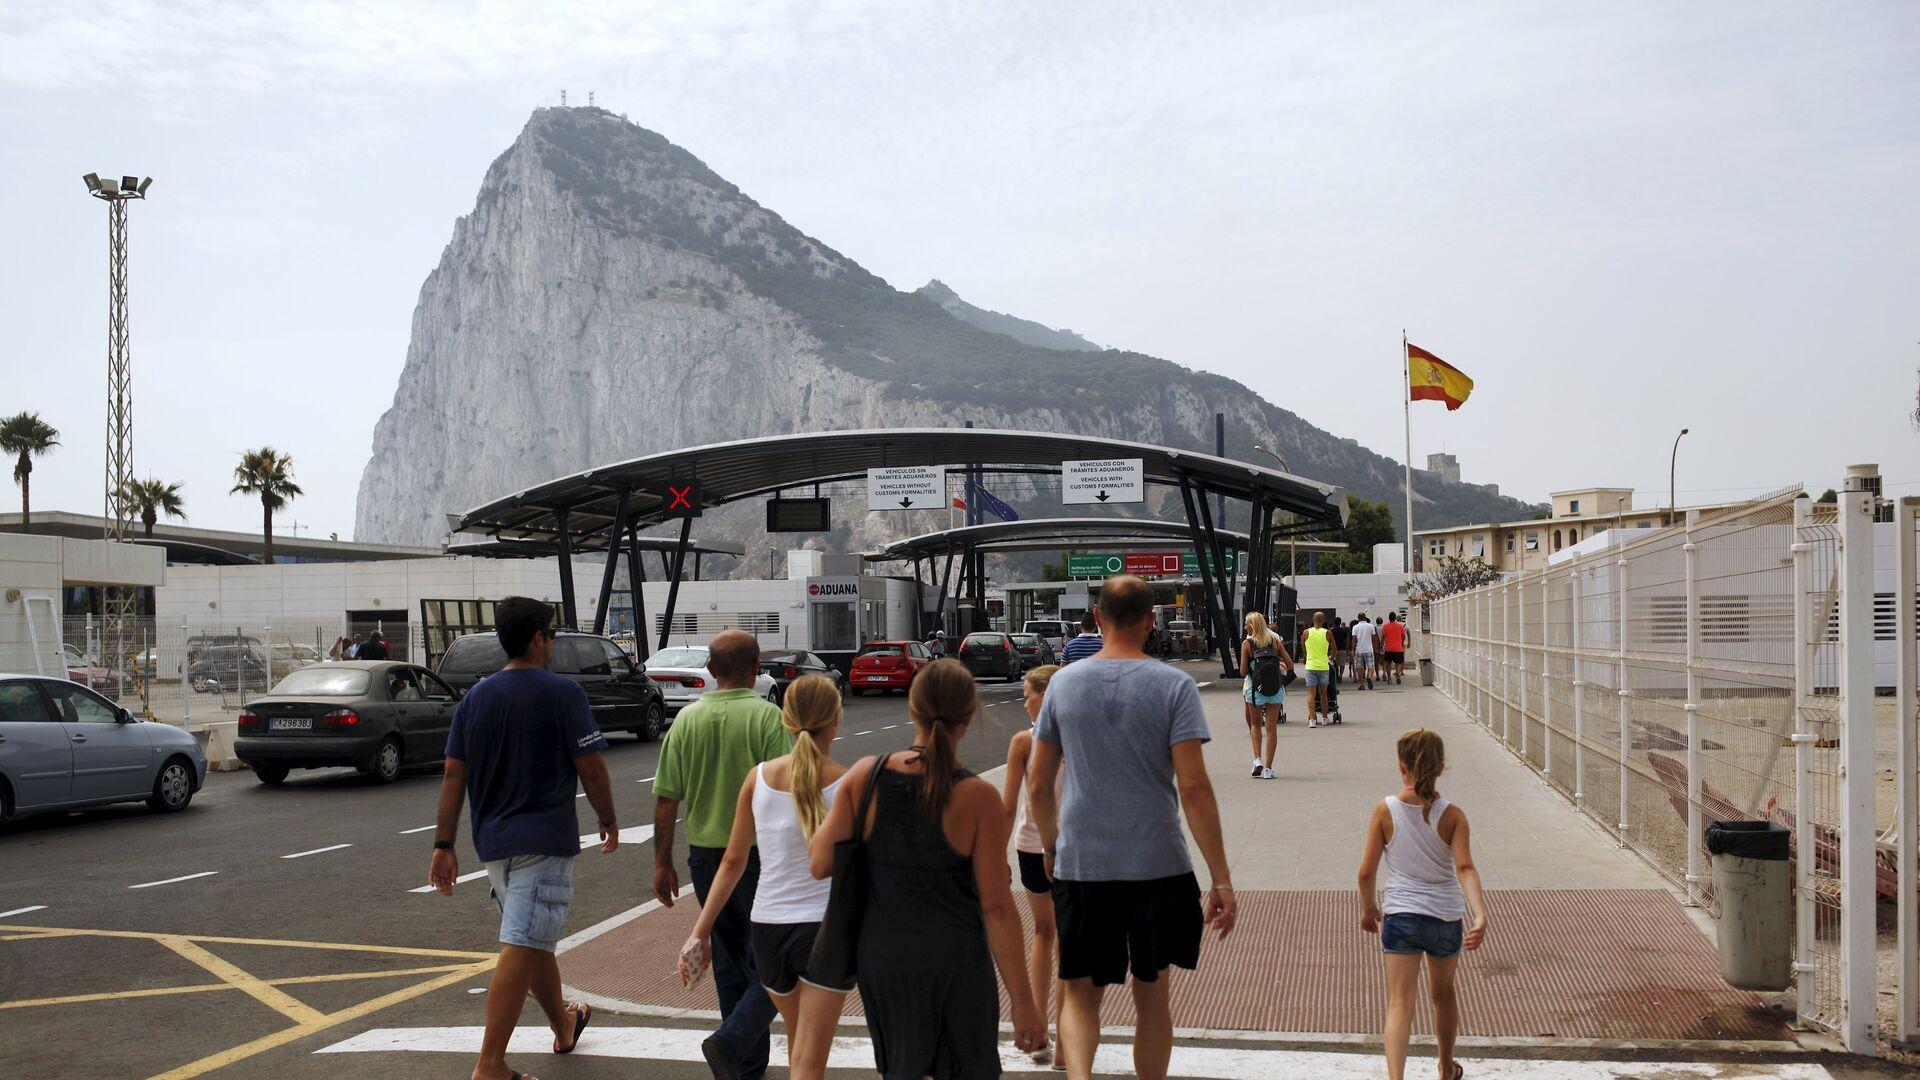 Tourists walk to enter the British colony of Gibraltar at its border with Spain, in La Linea de la Concepcion, southern Spain - Sputnik Mundo, 1920, 07.09.2021